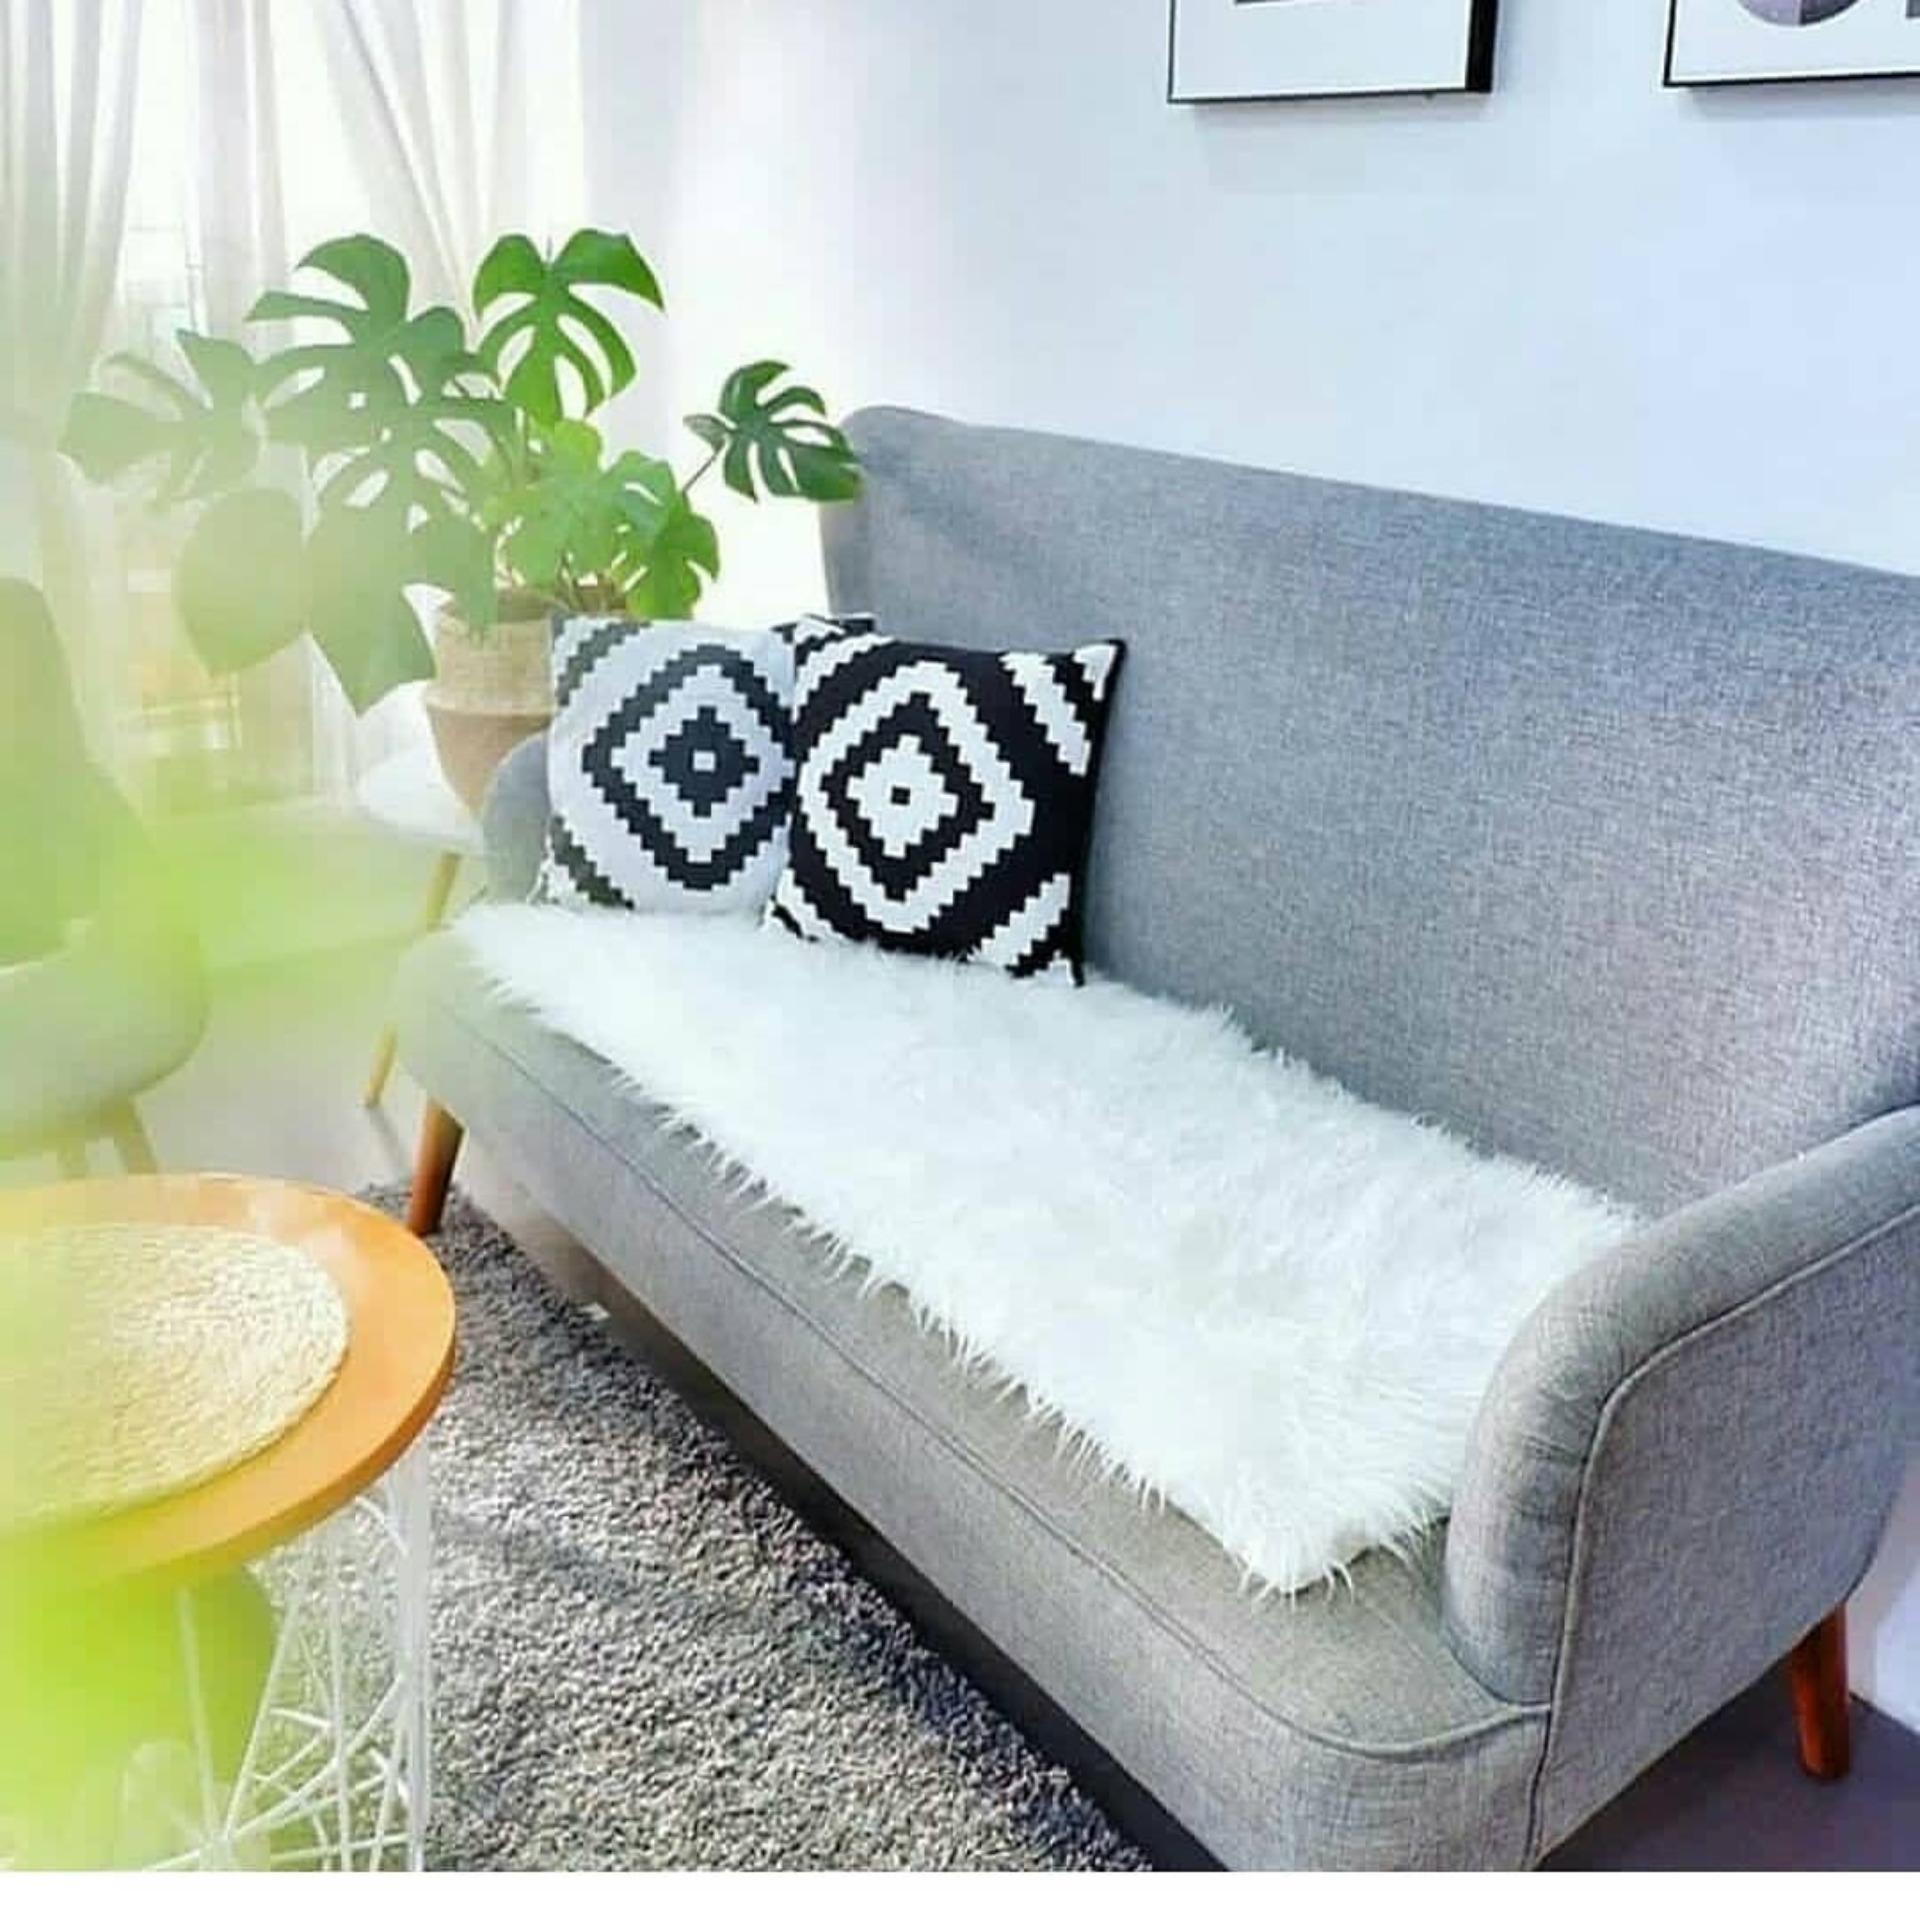 Alas Sofa Bulu Korea Putih By Pusat Karpet Bulu.